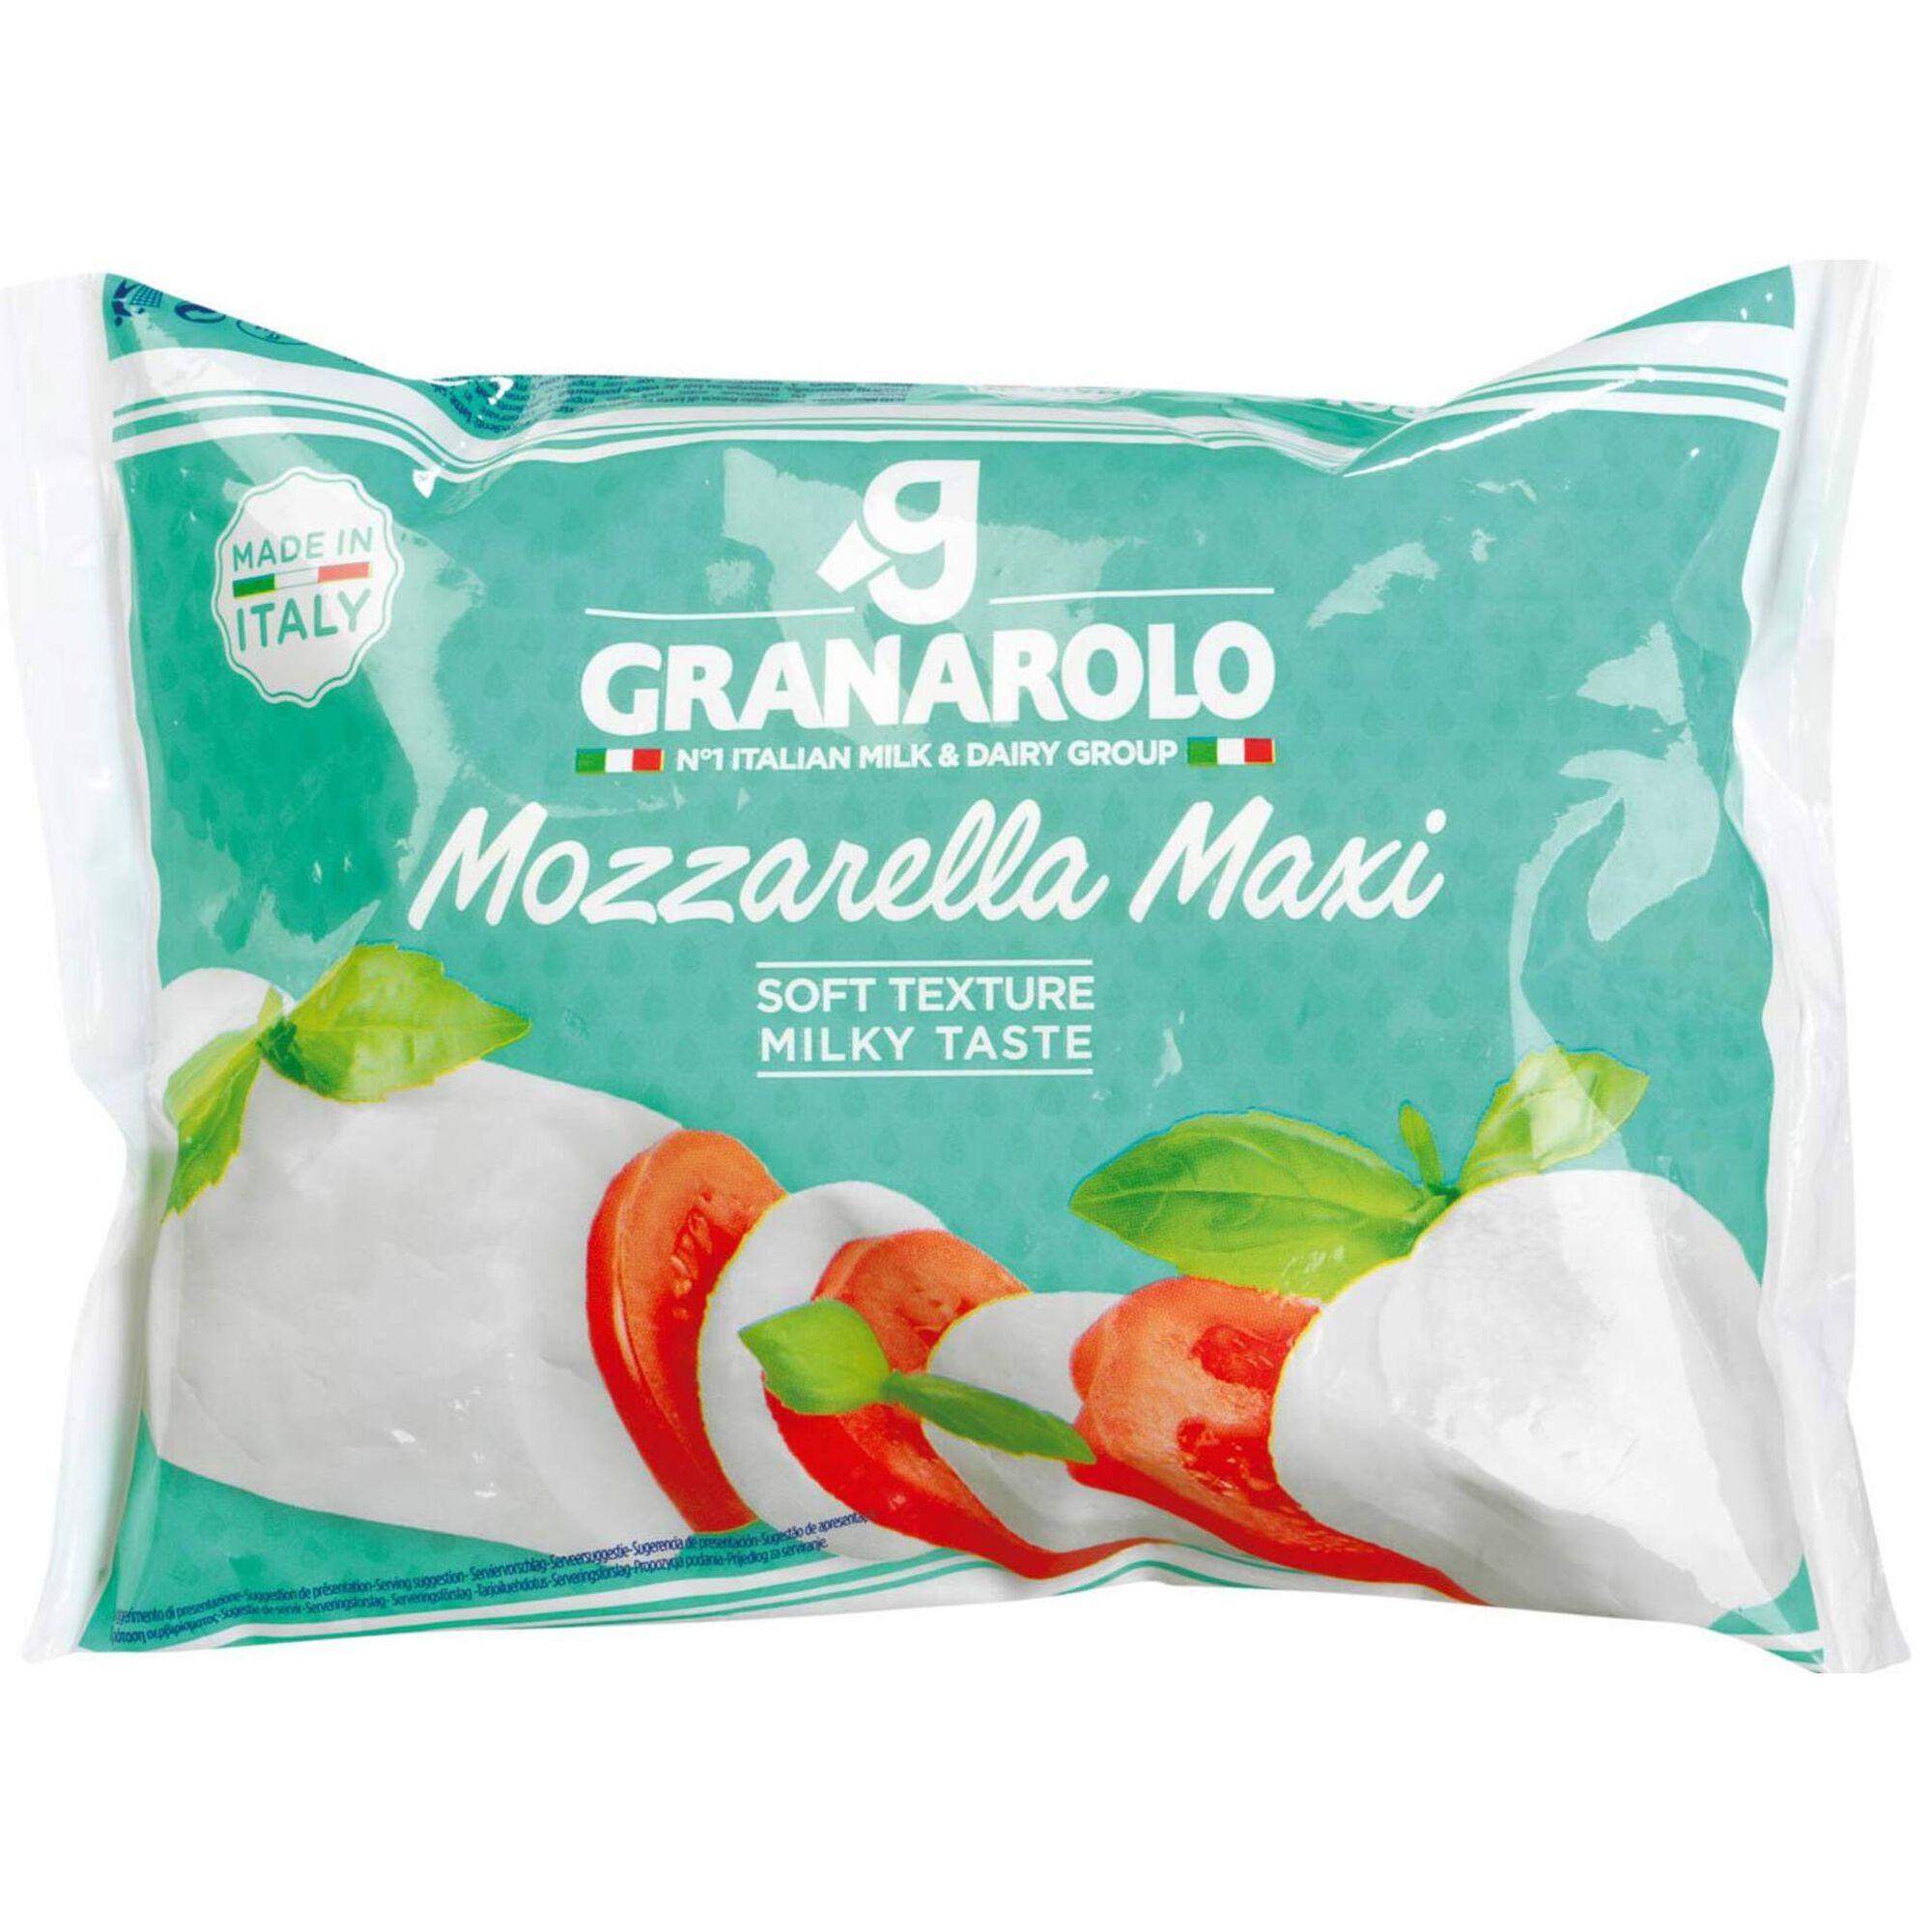 Queijo Mozzarella Maxi